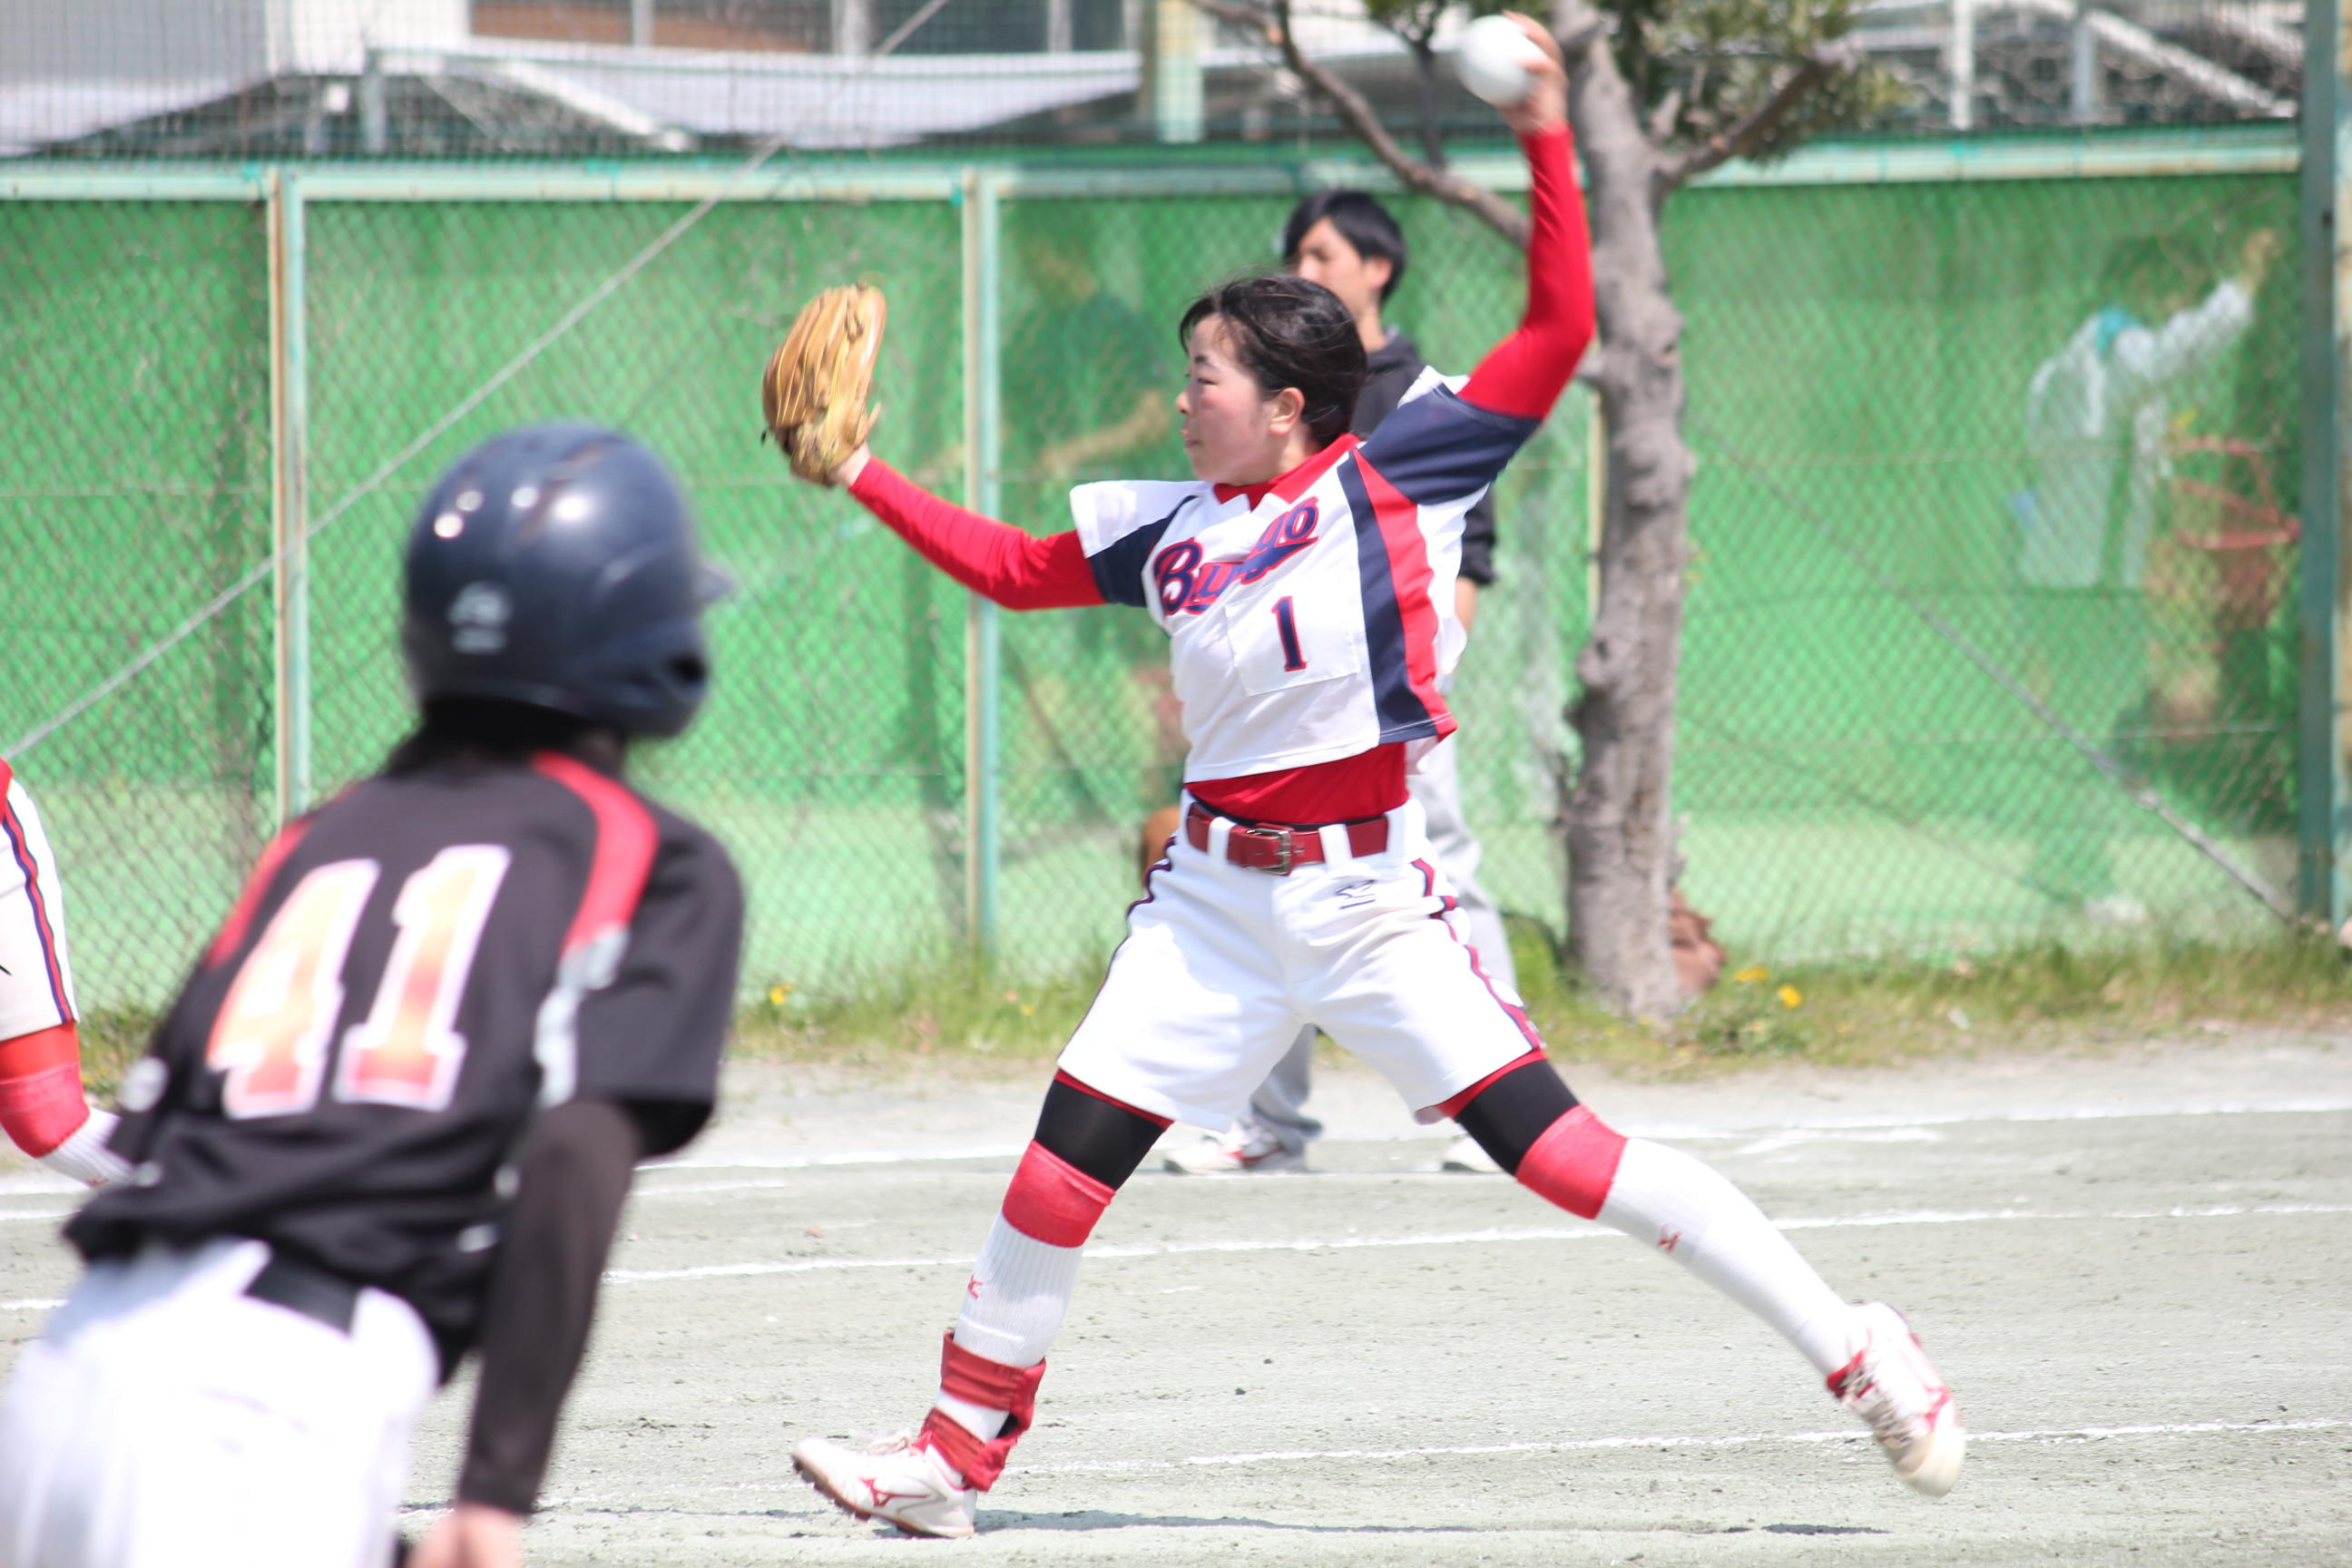 softball201803haruyasumi4.JPG